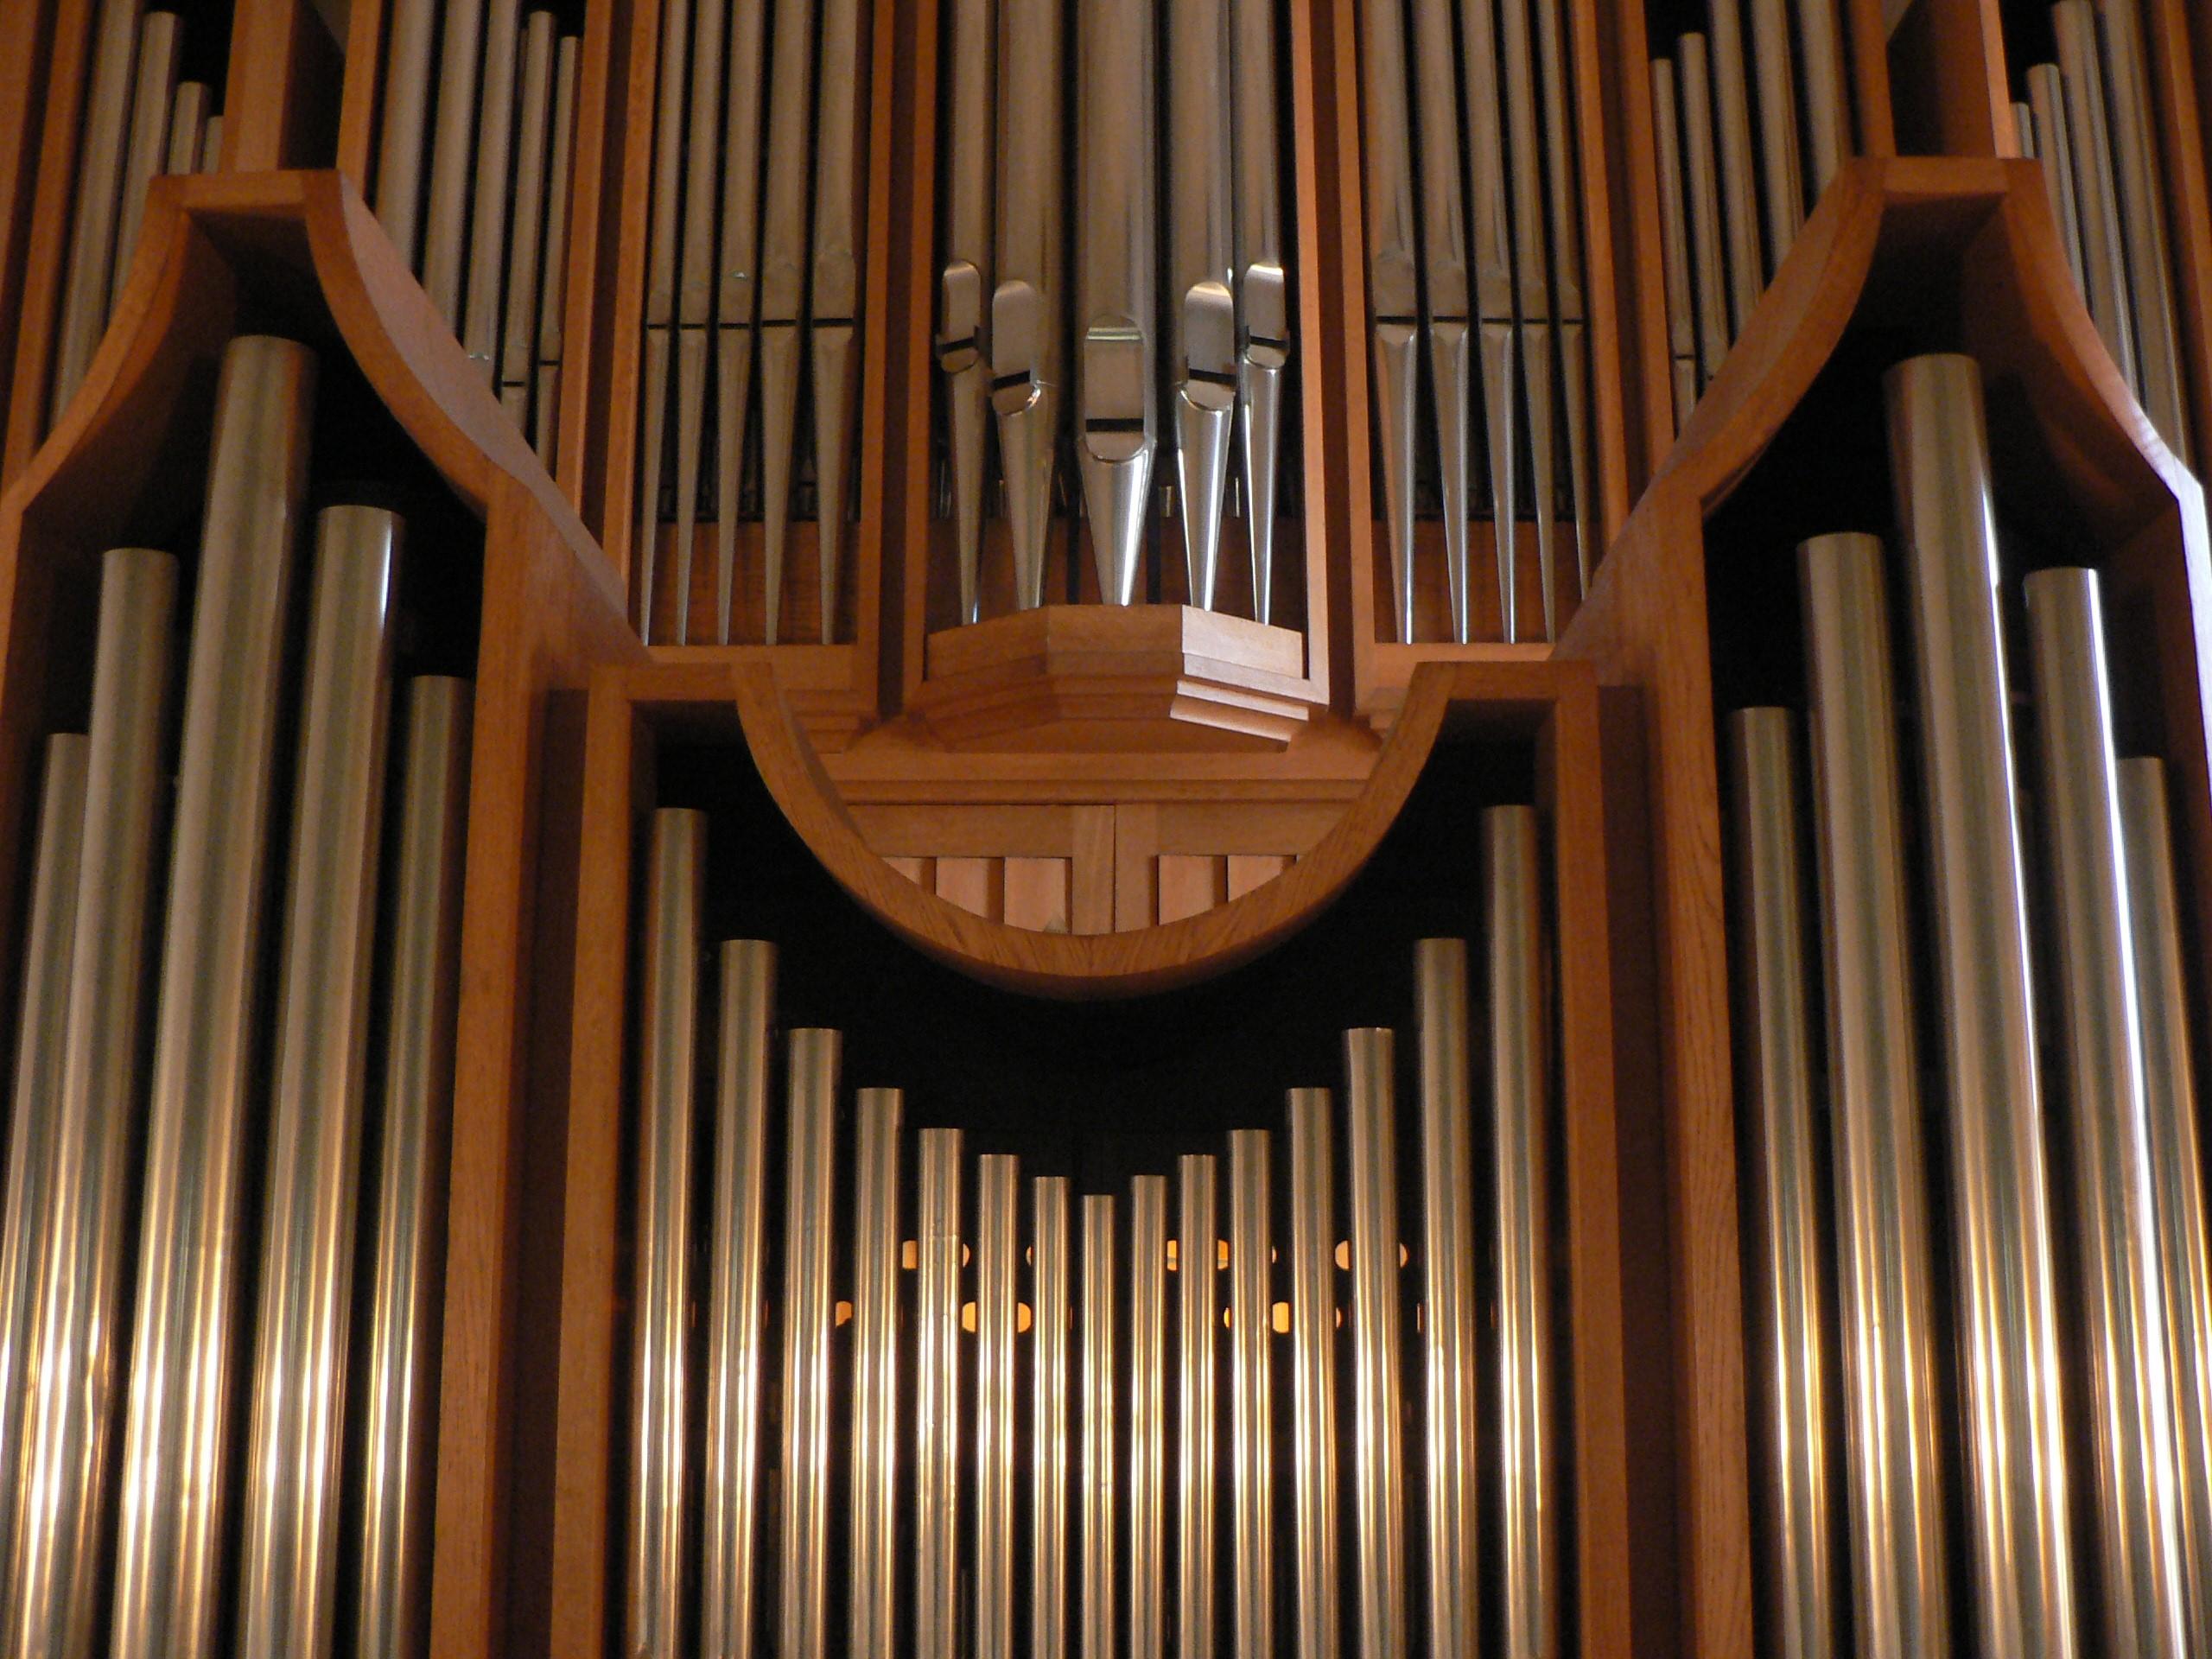 Liebfrauenkirche Orgel